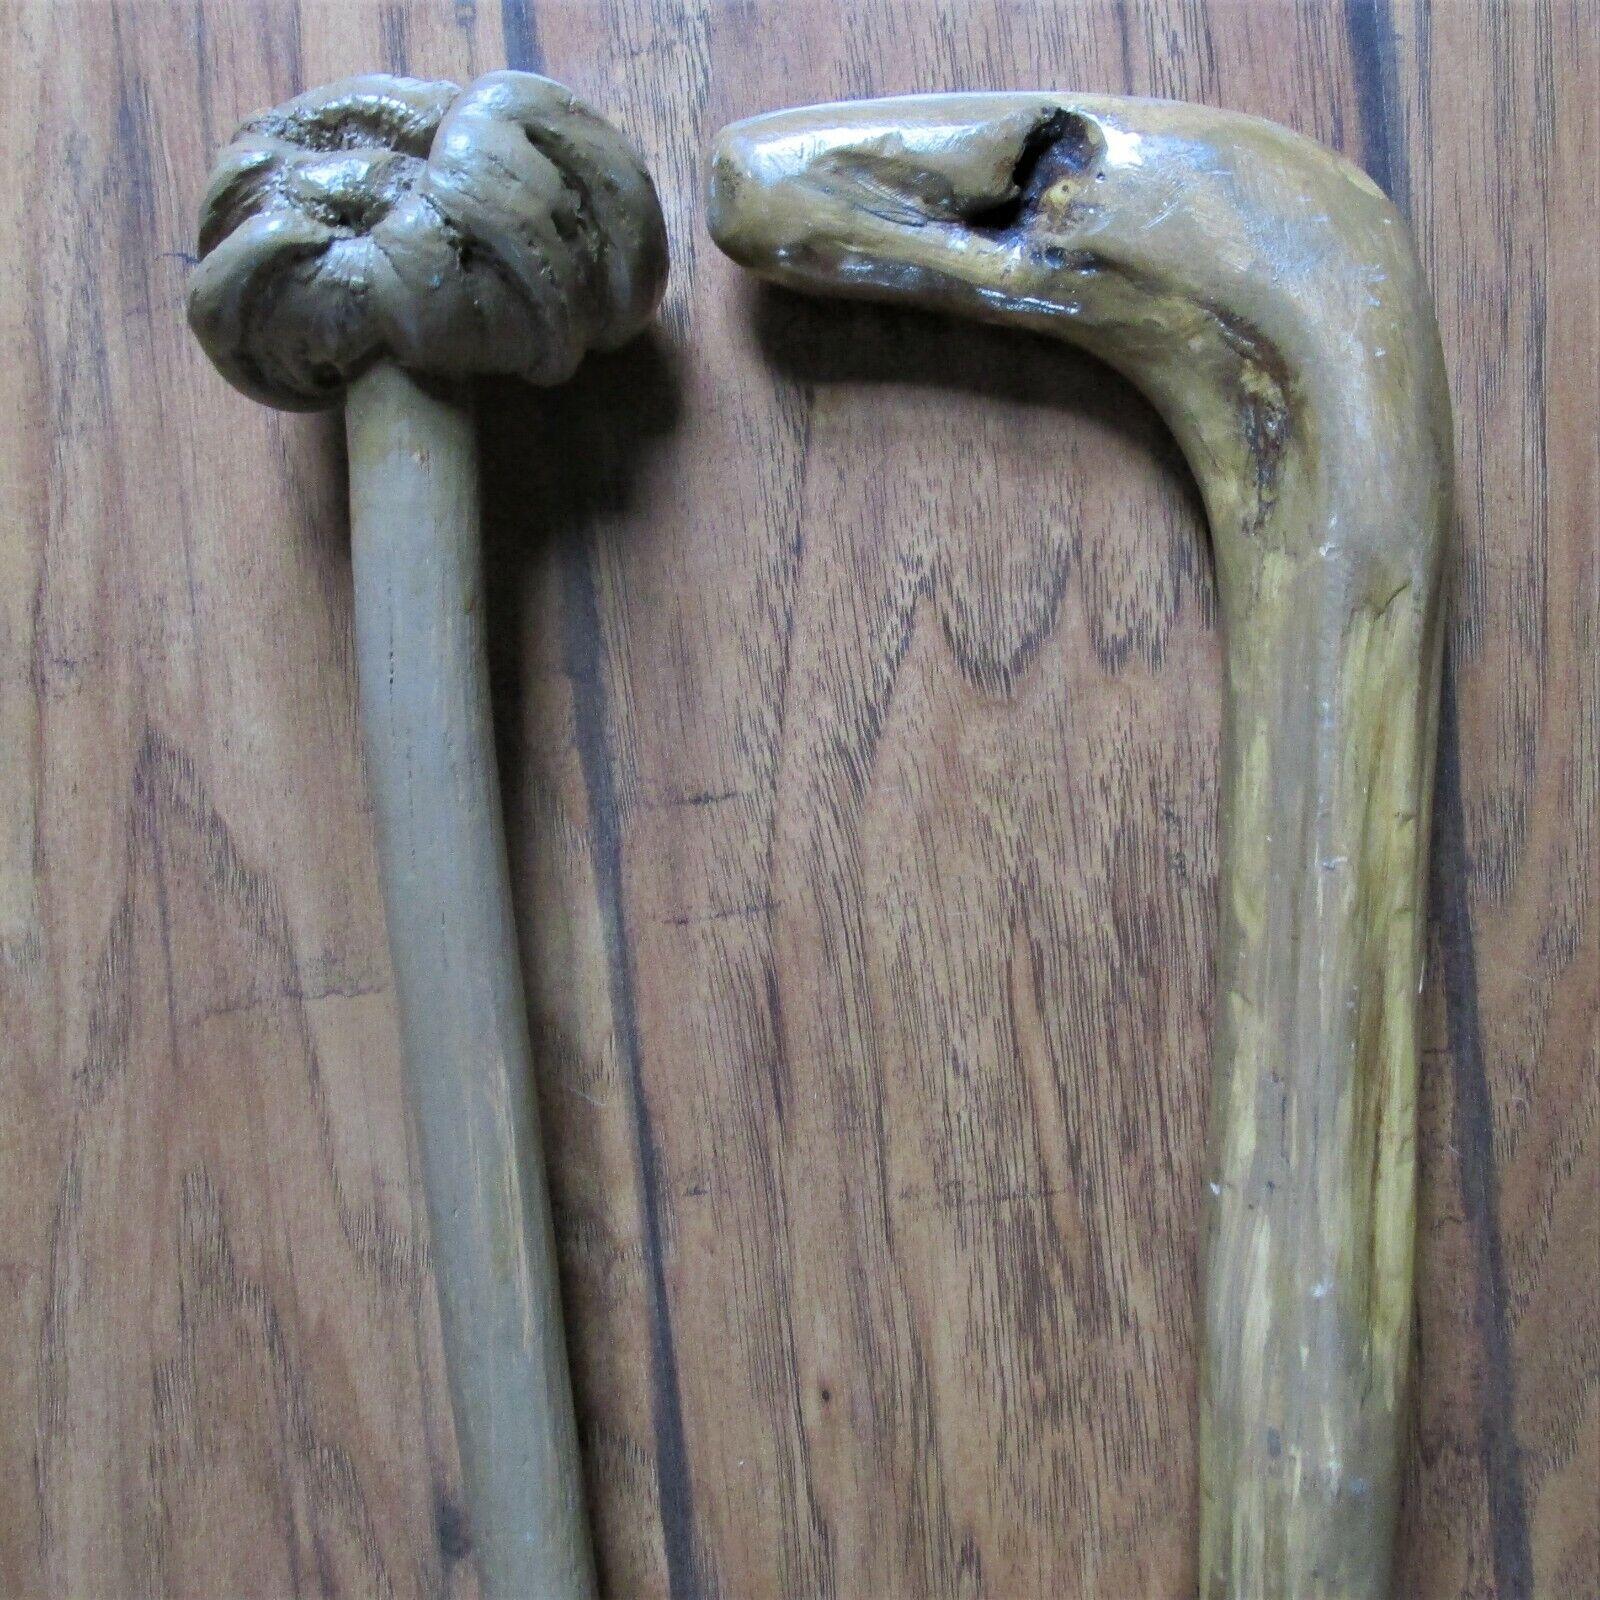 (2) Handmade Folk Art Natural Wood Walking Sticks/Canes Nice